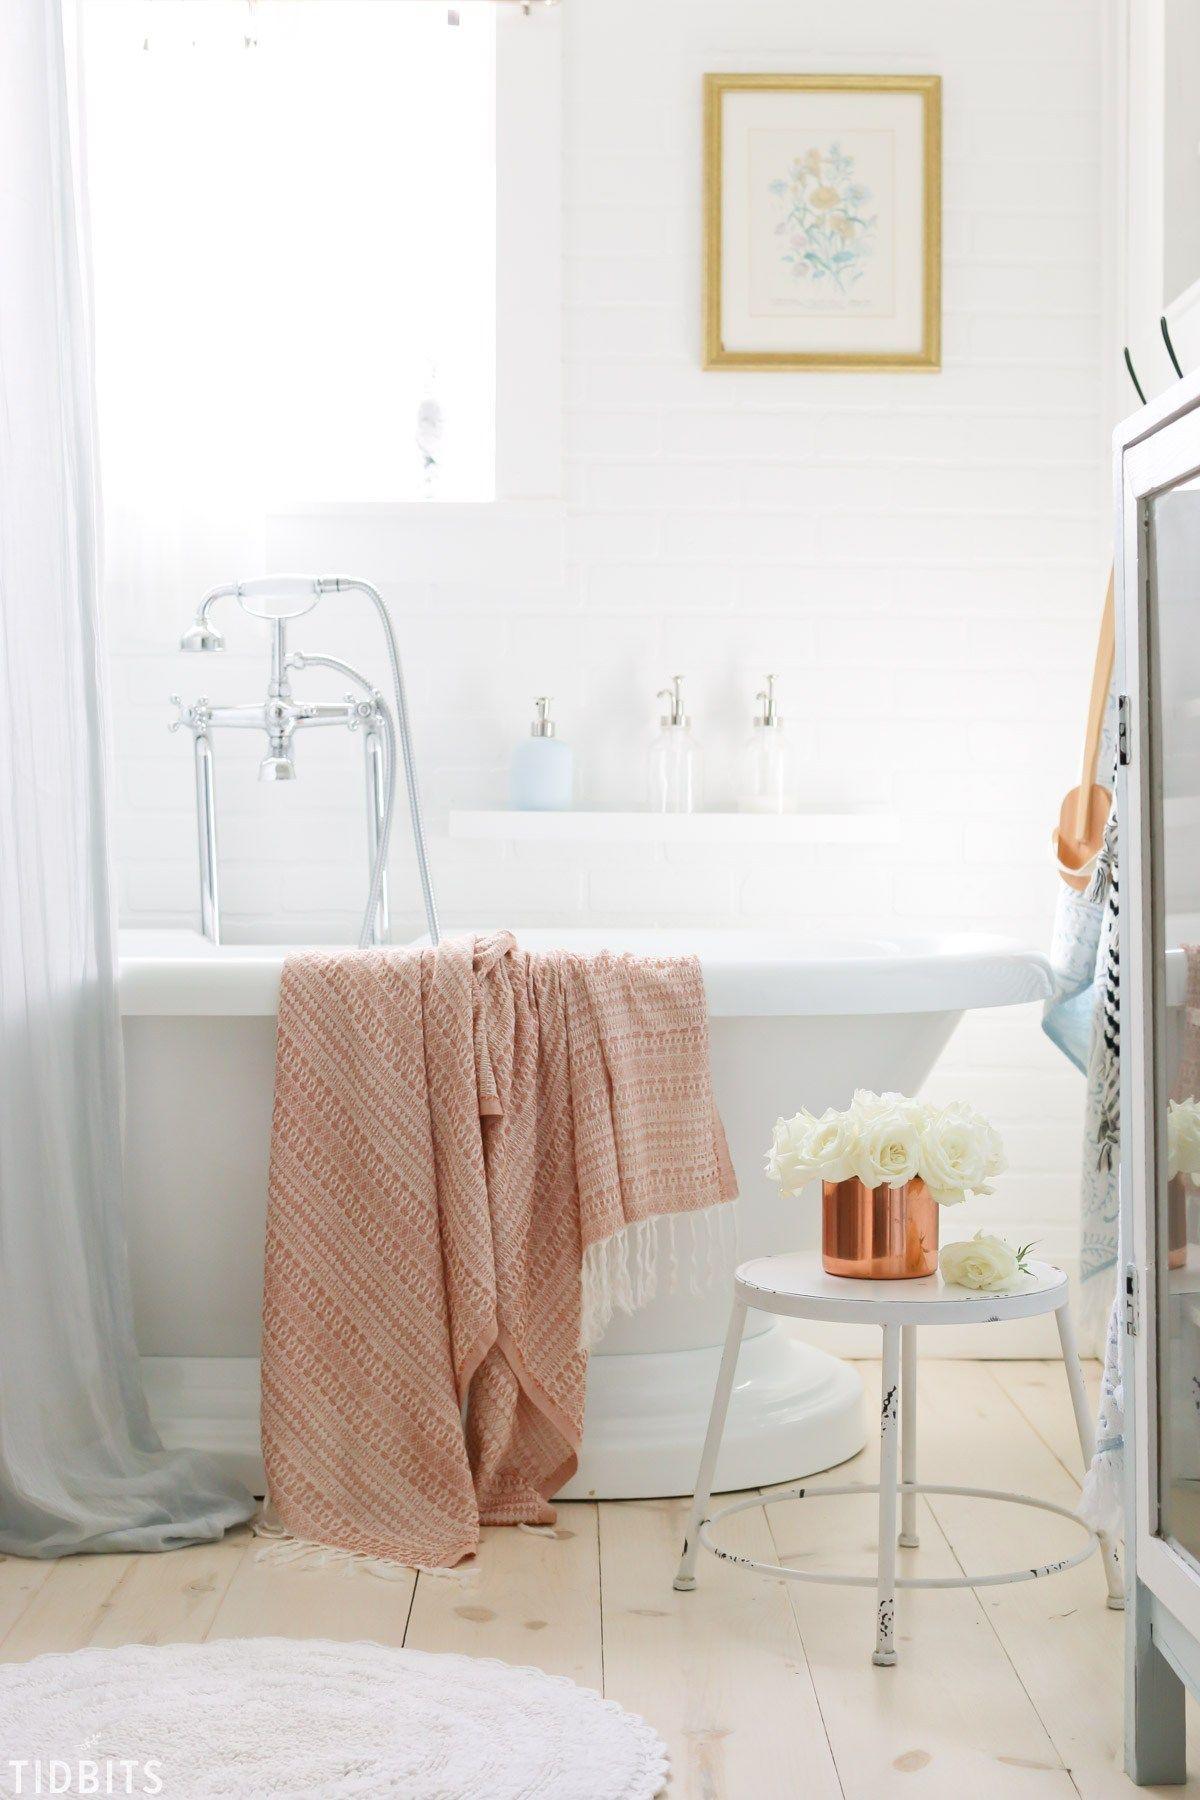 Fall Home Tour | h o m e | Pinterest | Girl bathrooms, Inspired ...